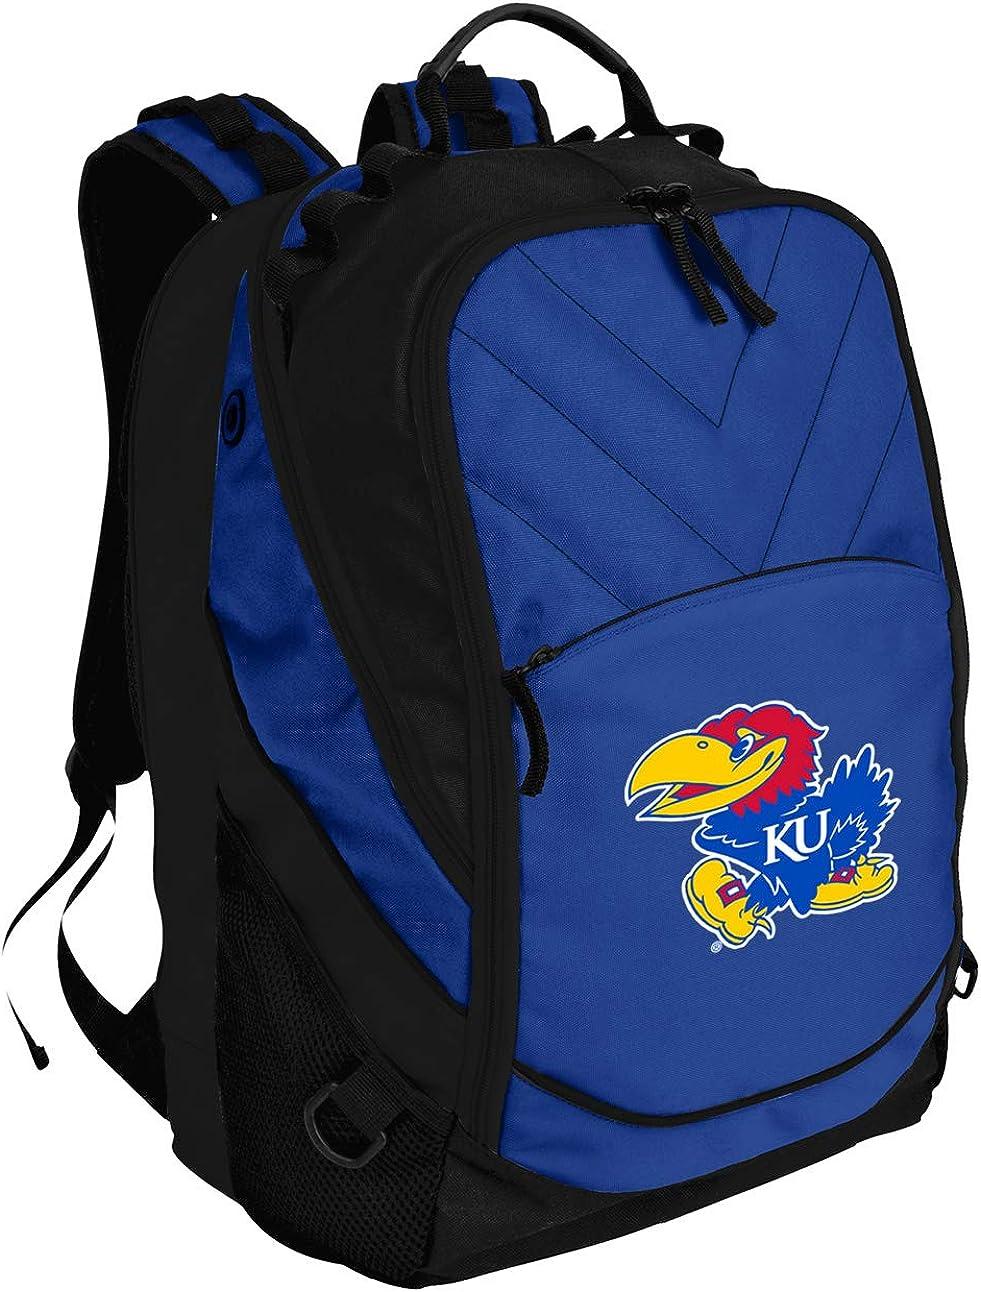 Broad Bay KU Jayhawks Backpack University of Kansas Bag w/Laptop Section